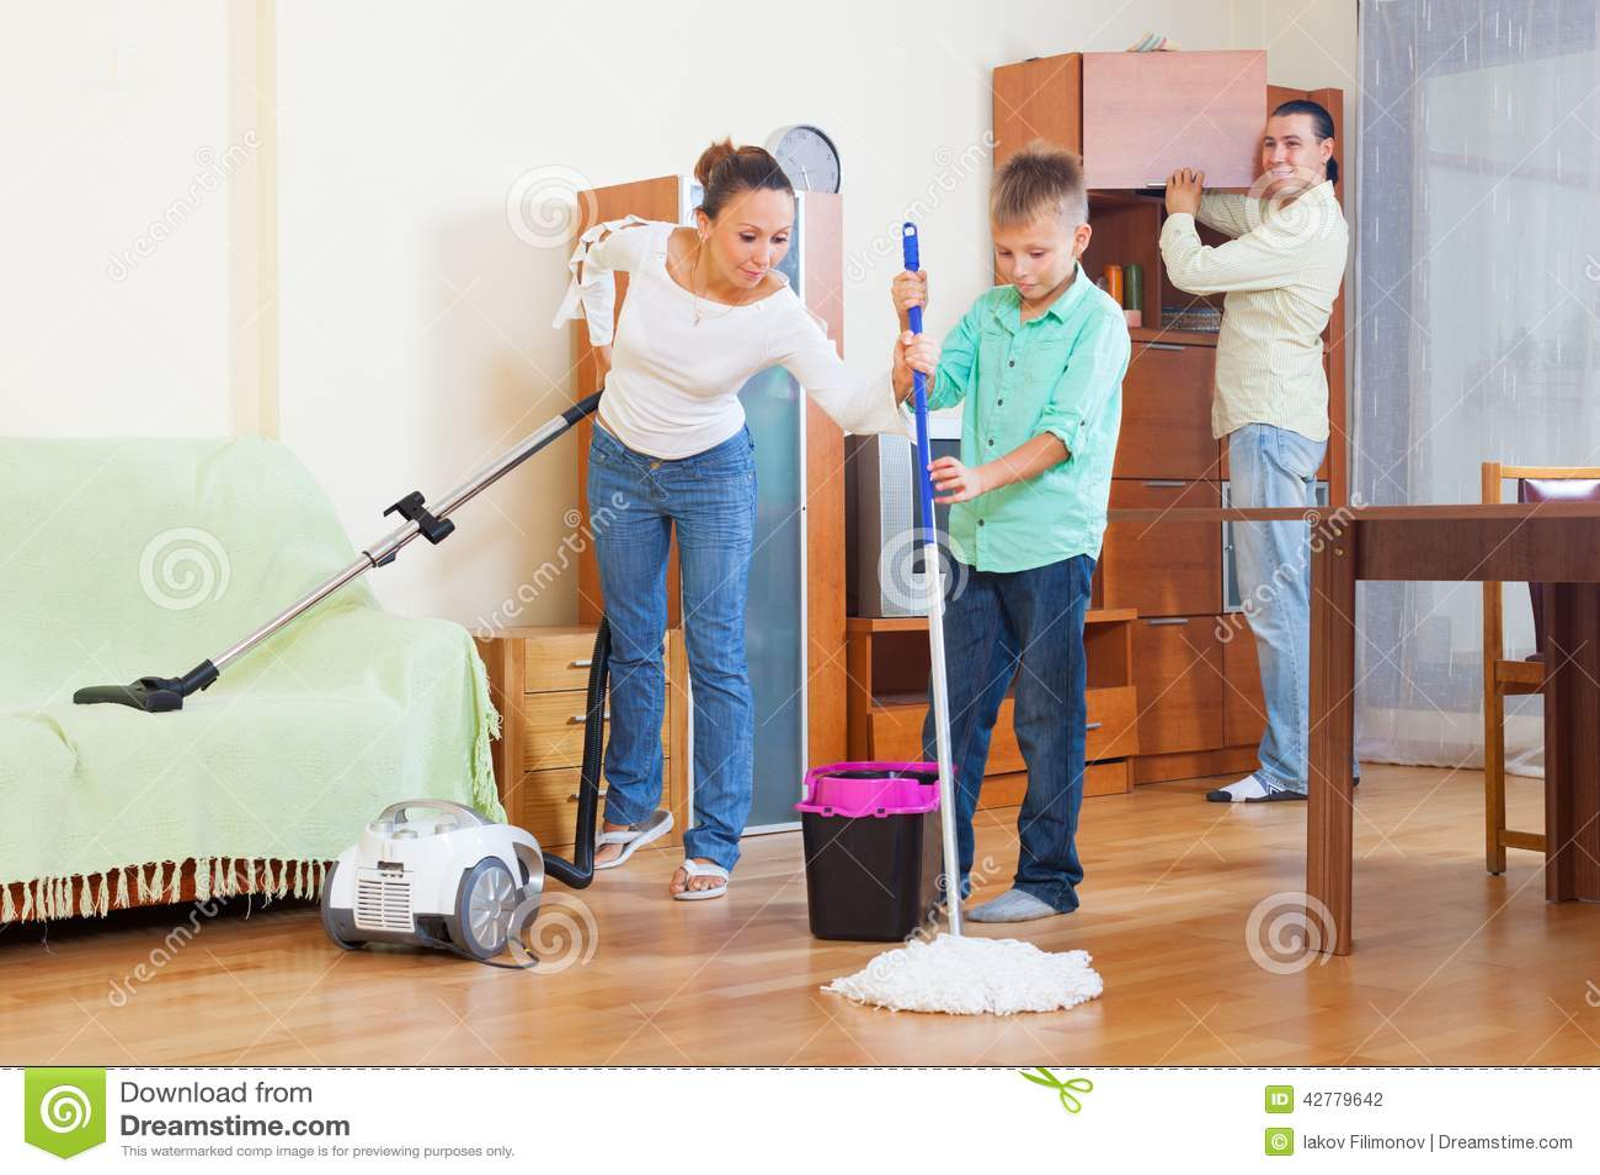 Vacuuming The Family Room